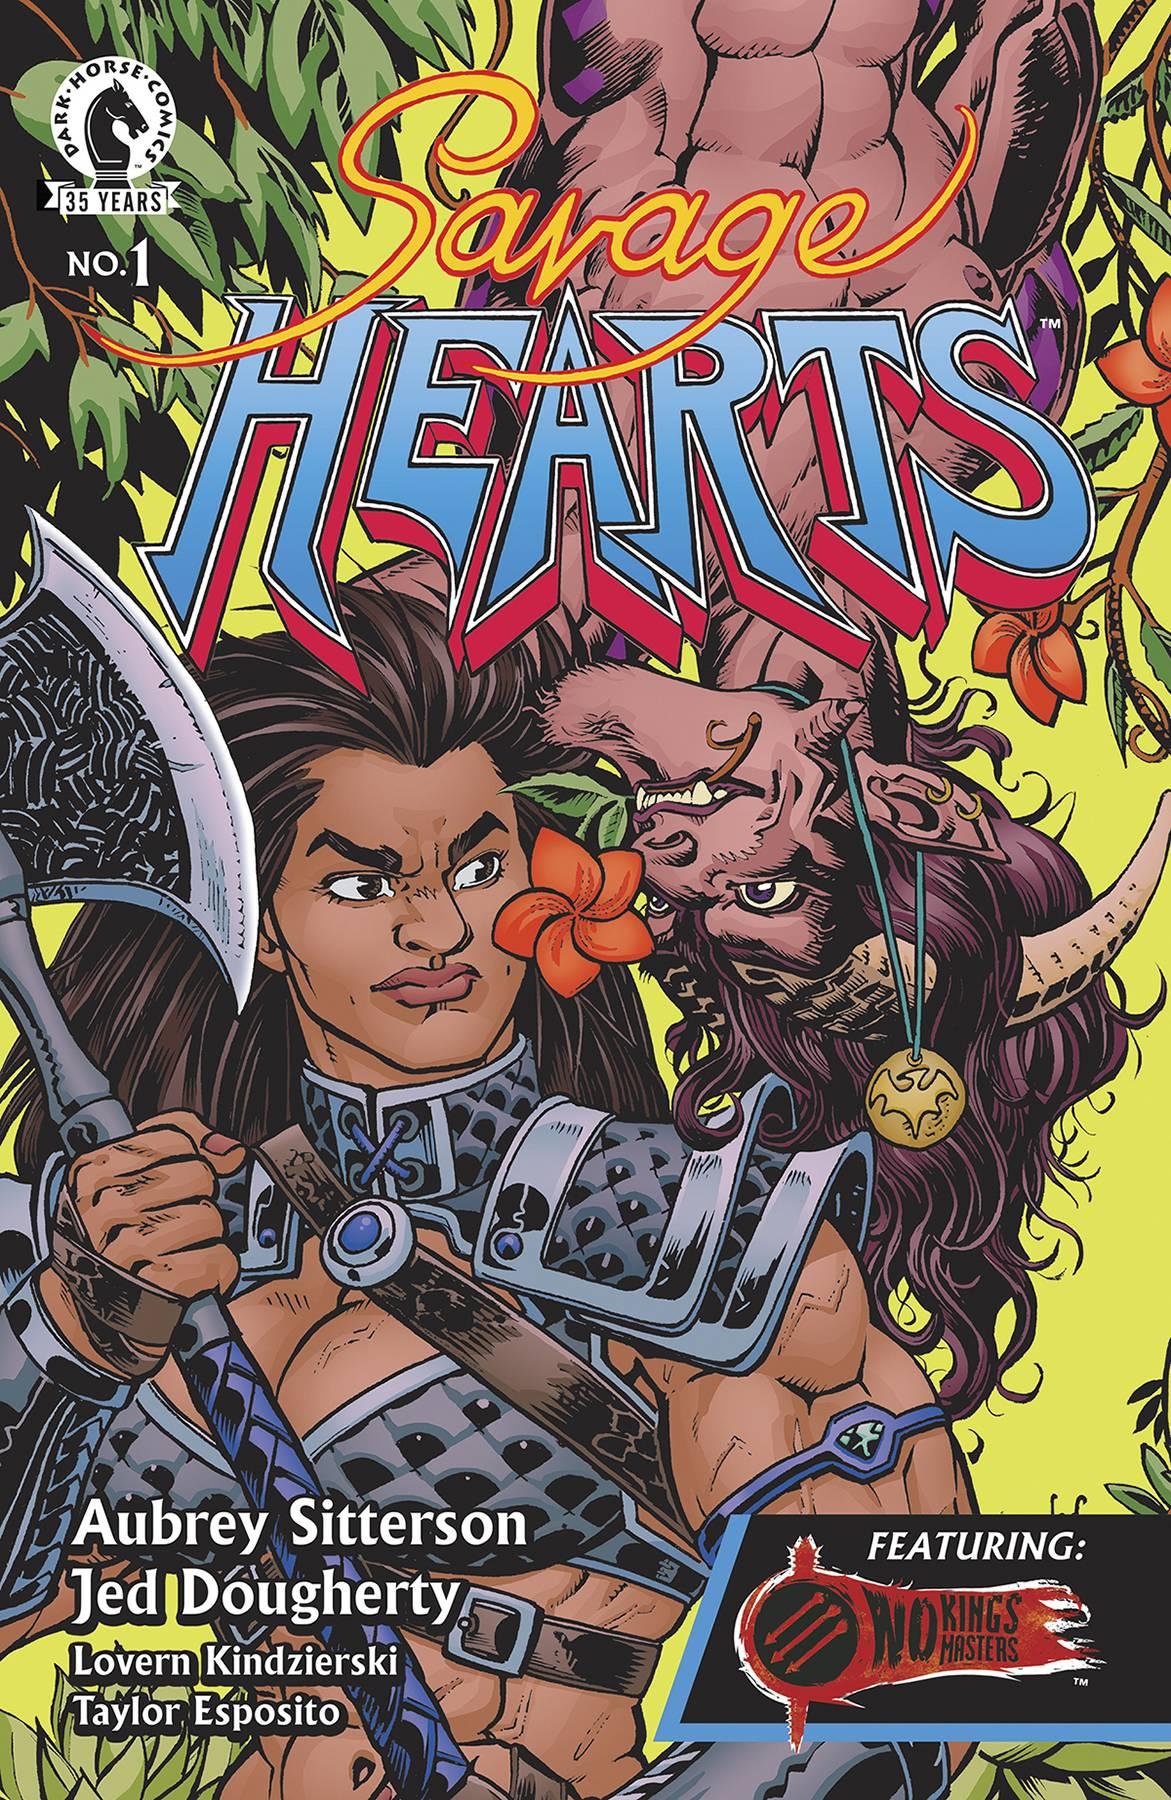 SAVAGE HEARTS #1 (OF 5) (MR)